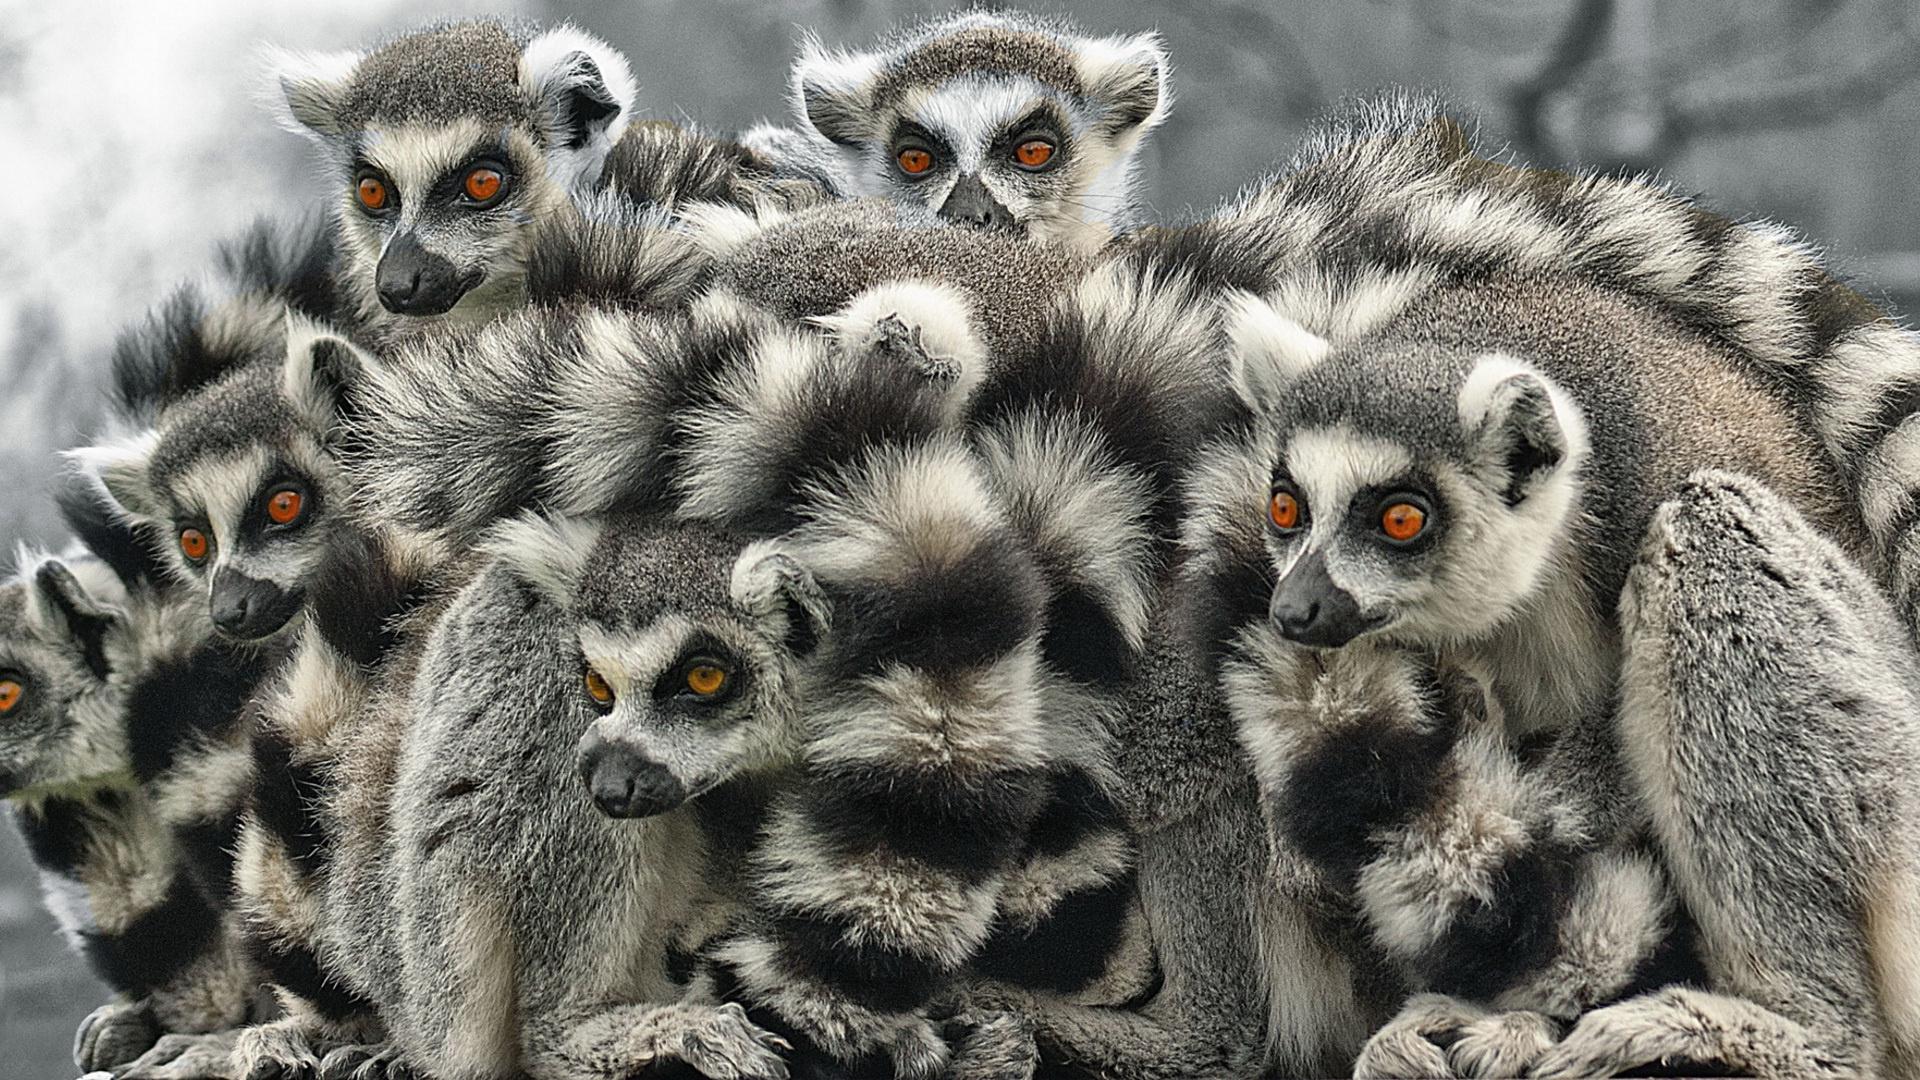 download wallpaper 3840x2160 lemur - photo #11